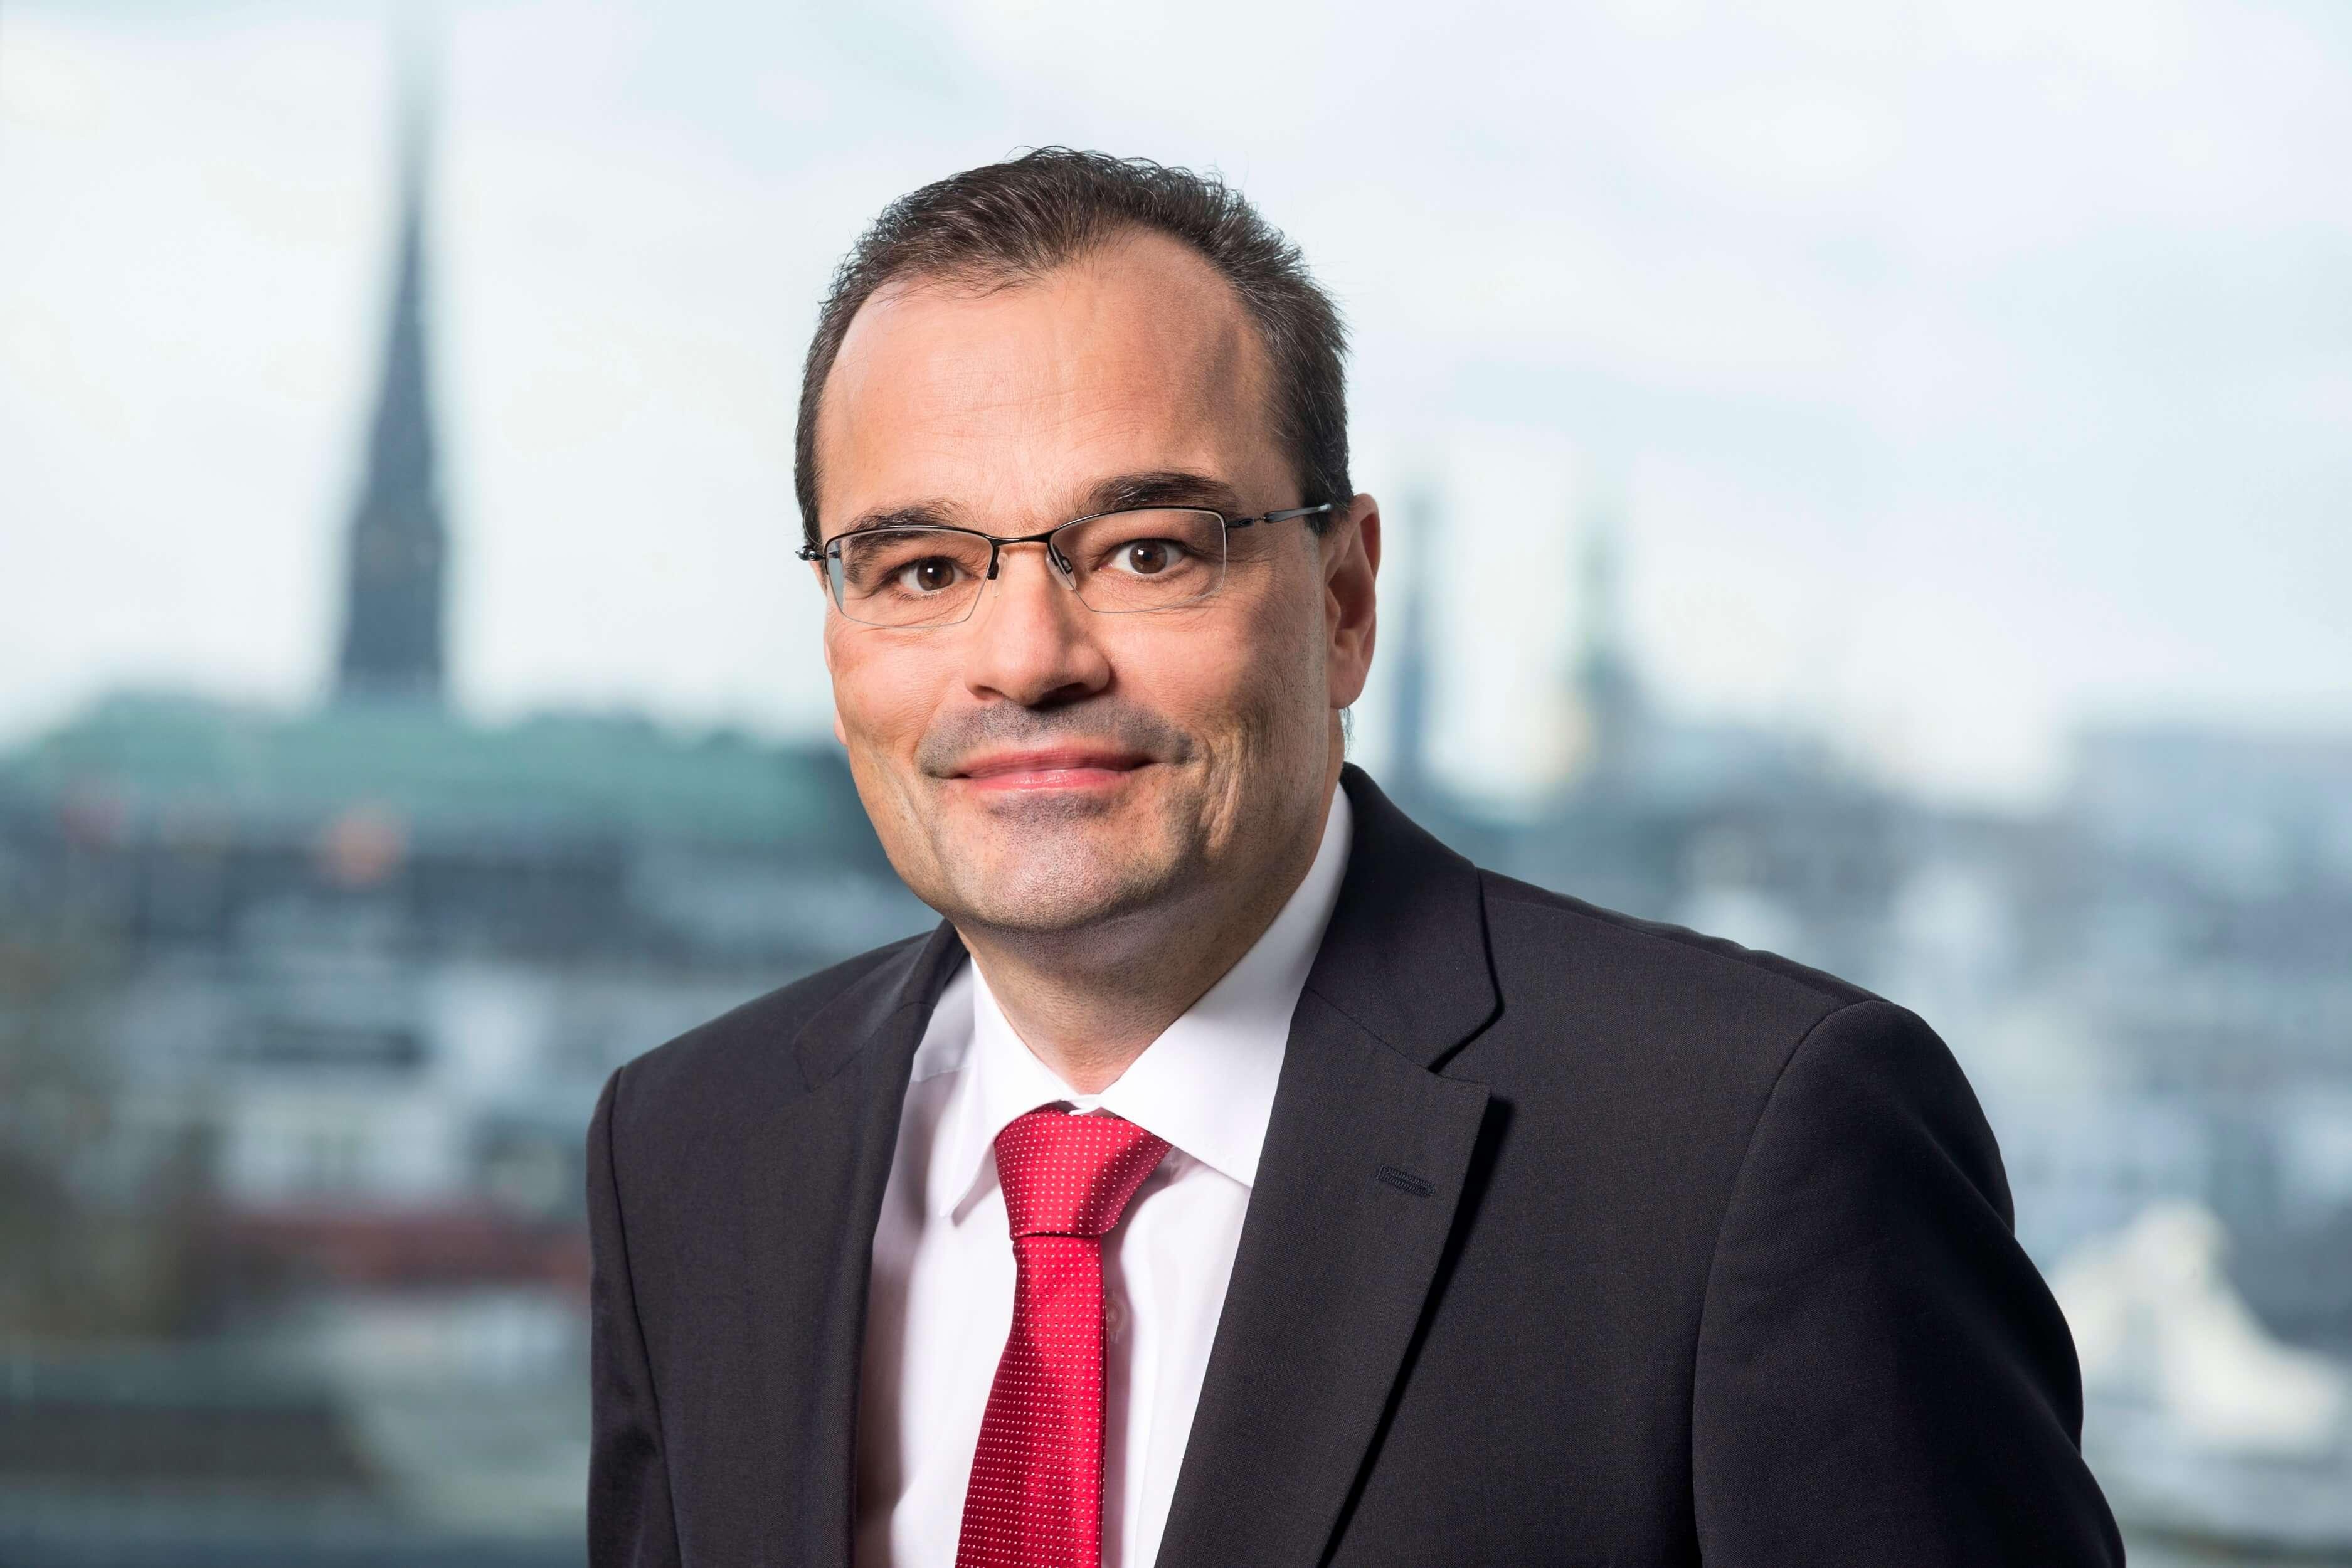 Markus-Tacke-new-Siemens-Gamesas-CEO-1 Siemens Gamesa Names Markus Tacke New CEO